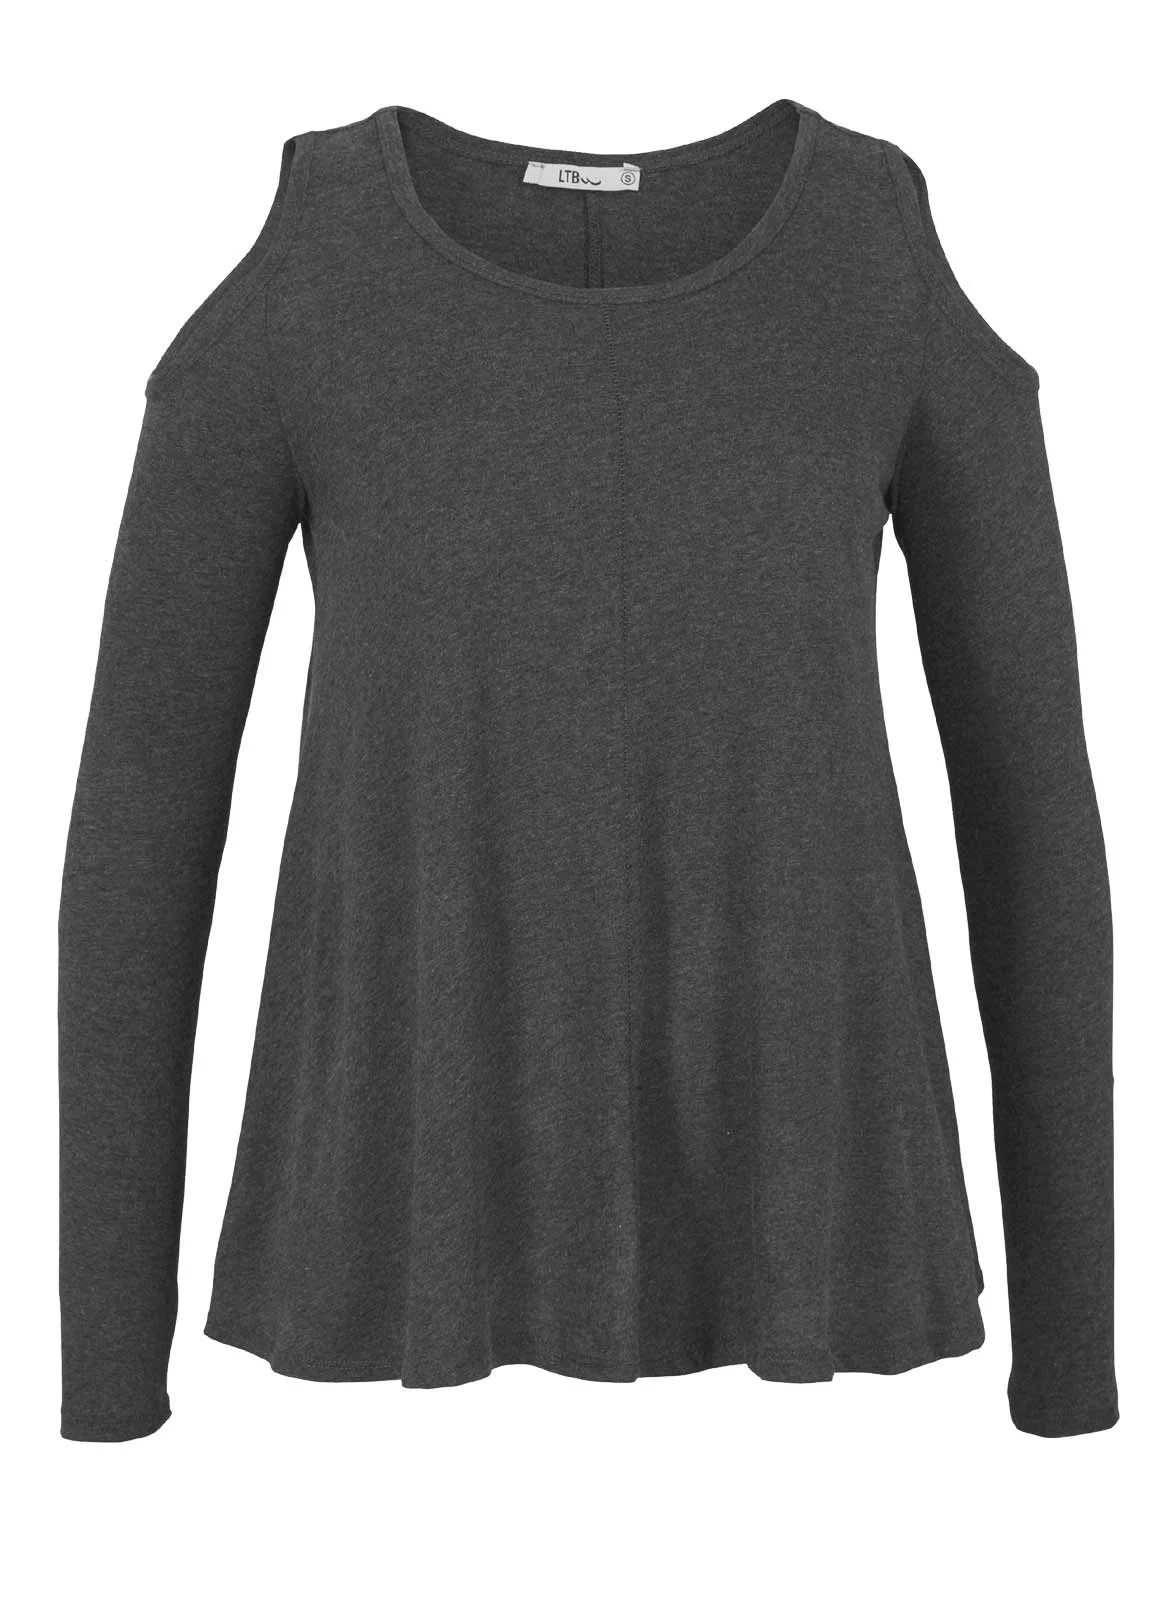 788.772 LTB Damen-Shirt Grau-Melange